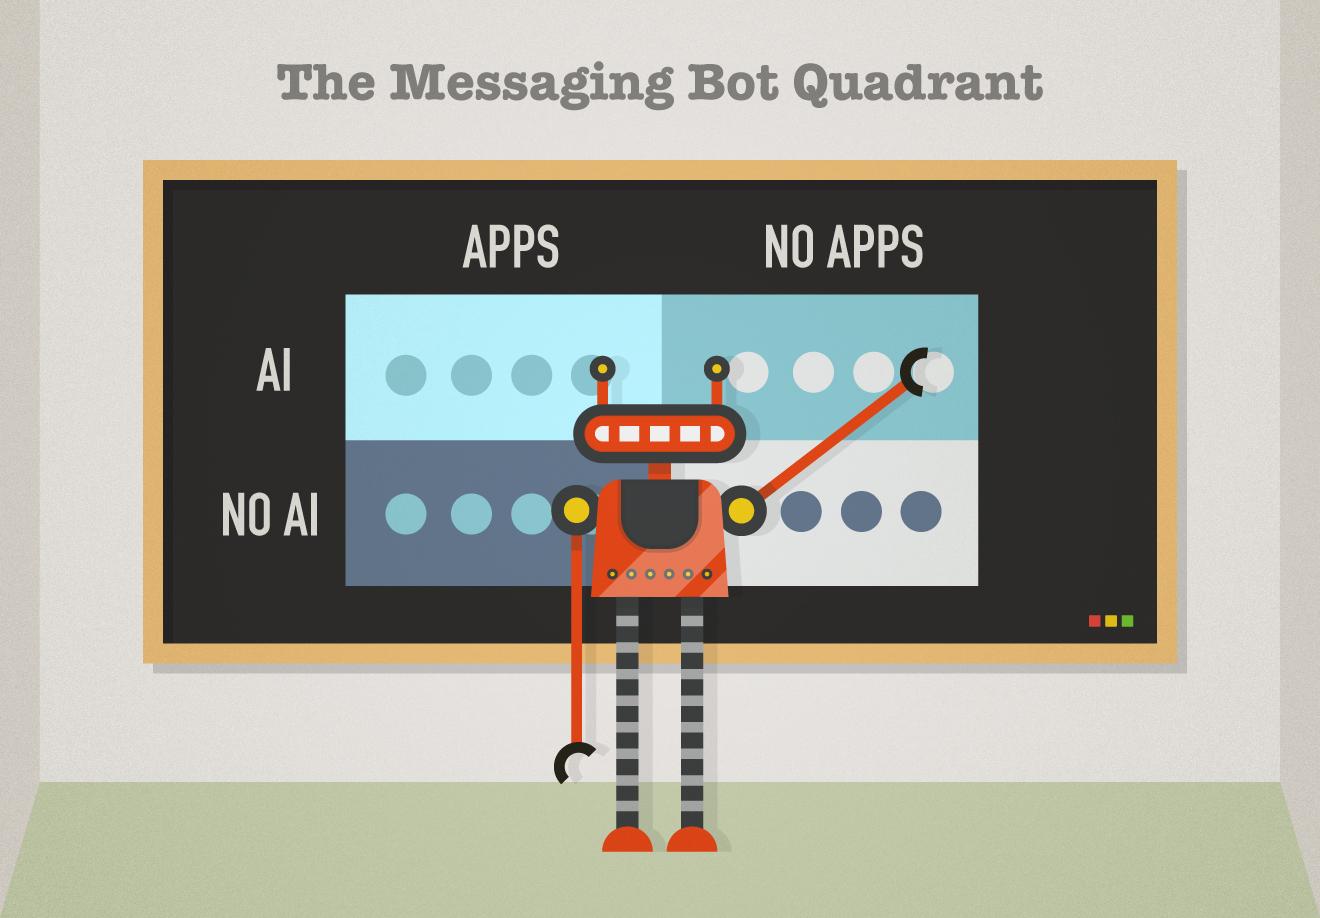 The messaging bot quadrant